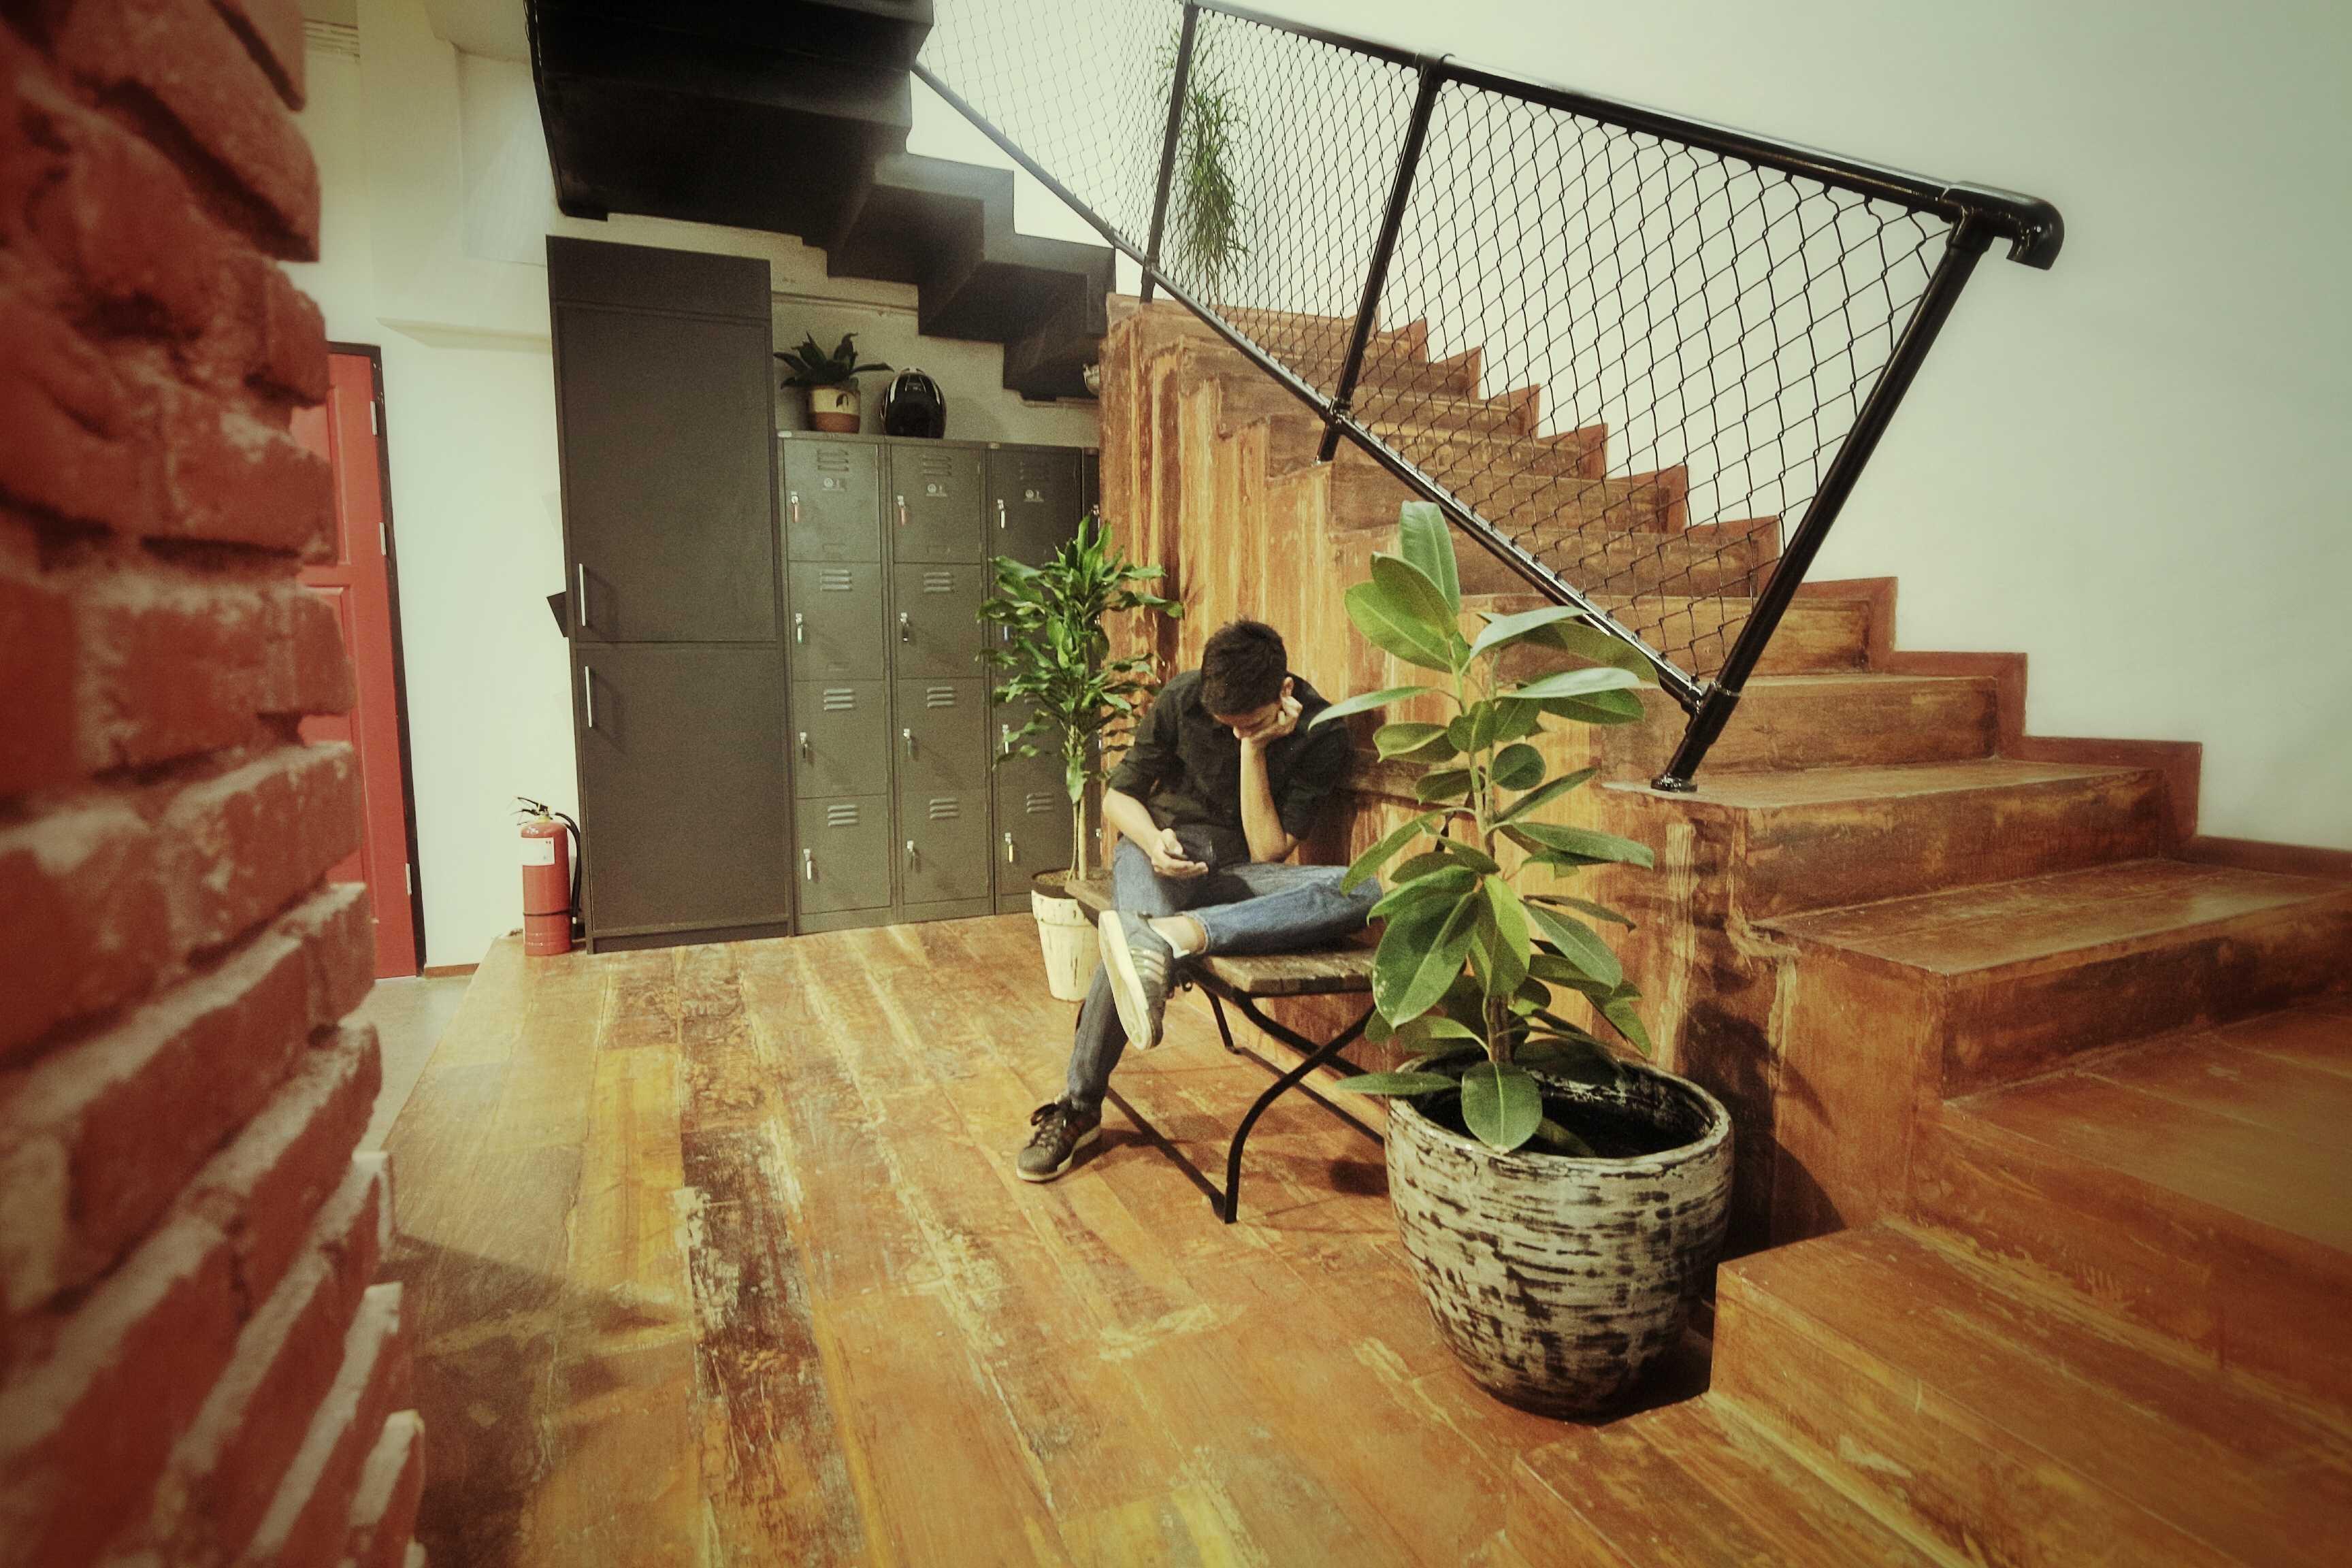 Kotak Design Tier Space Interior Jakarta, Daerah Khusus Ibukota Jakarta, Indonesia Jakarta, Daerah Khusus Ibukota Jakarta, Indonesia Tier Space Interior - Locker Area   45466